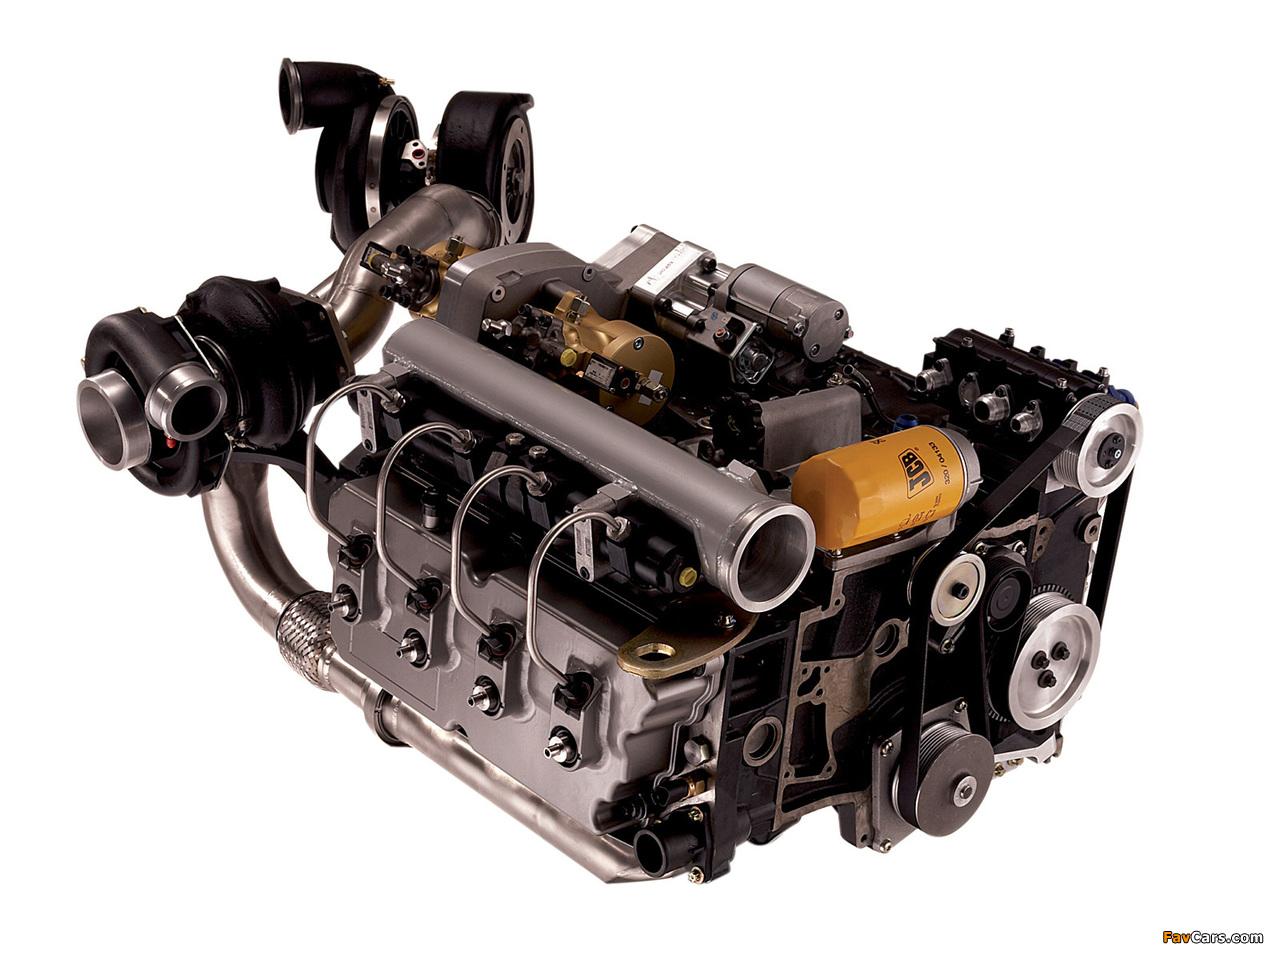 Photos of JCB Dieselmax (1280 x 960)